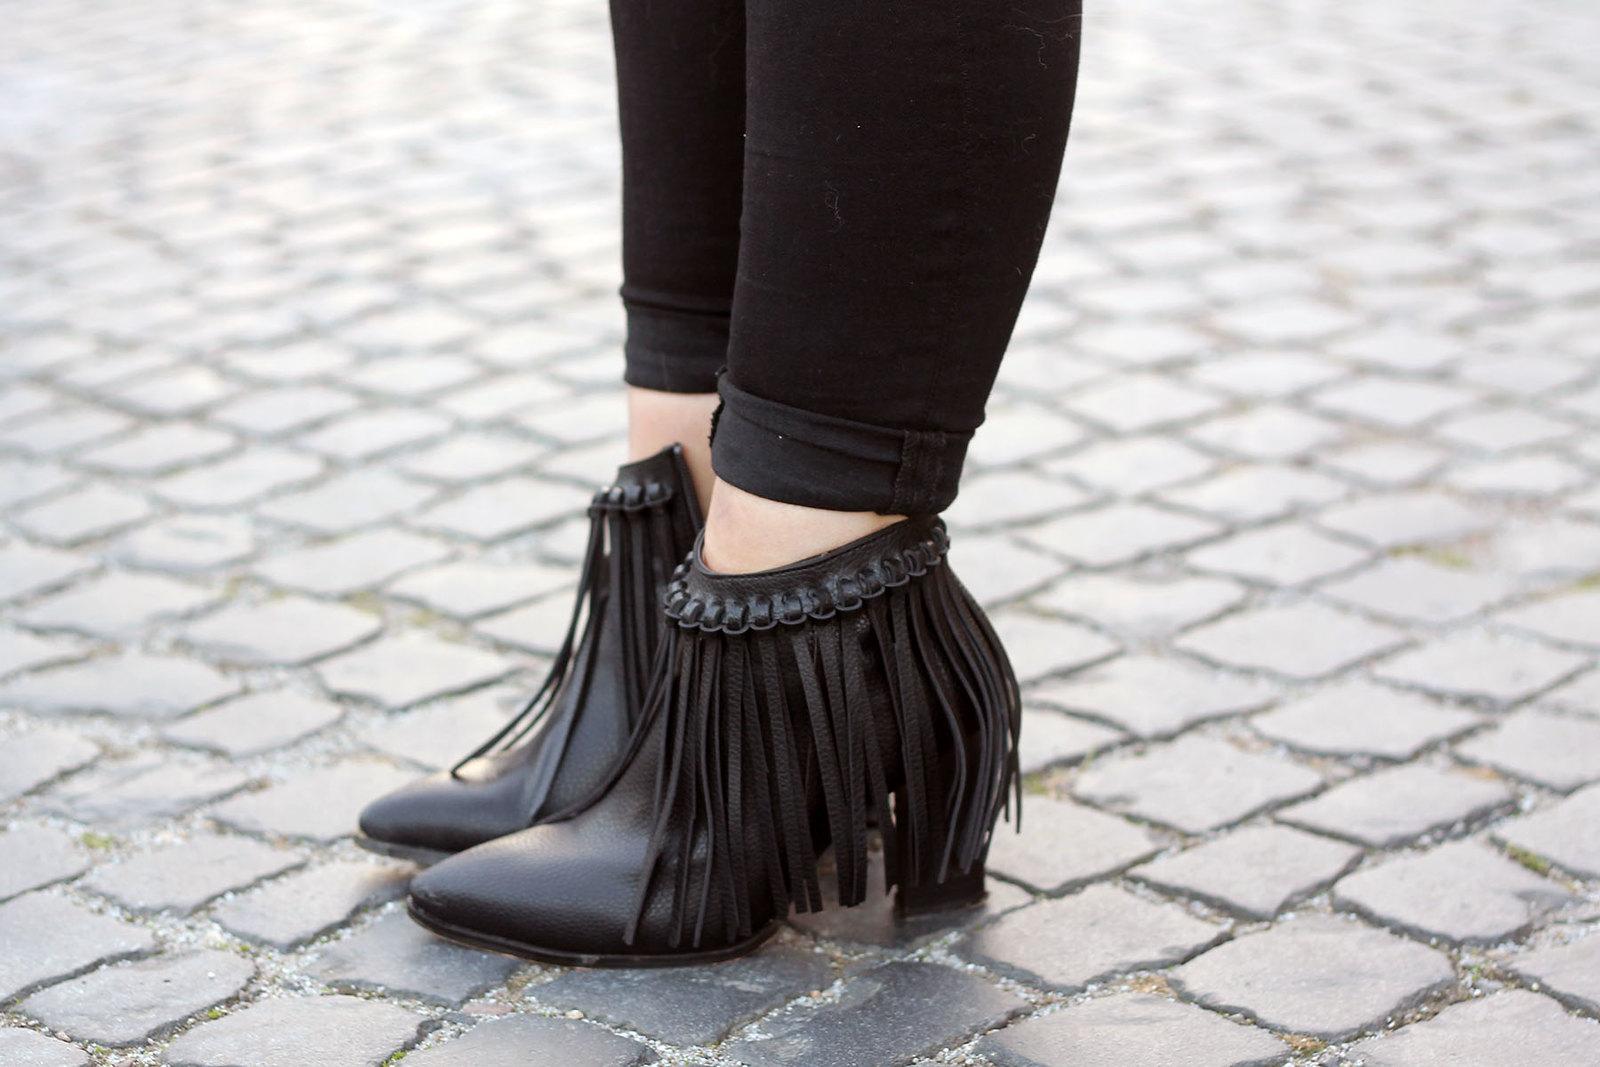 outfit-fransenboots-stiefeletten-sam-edelmann-fashionblog-modeblog-trend